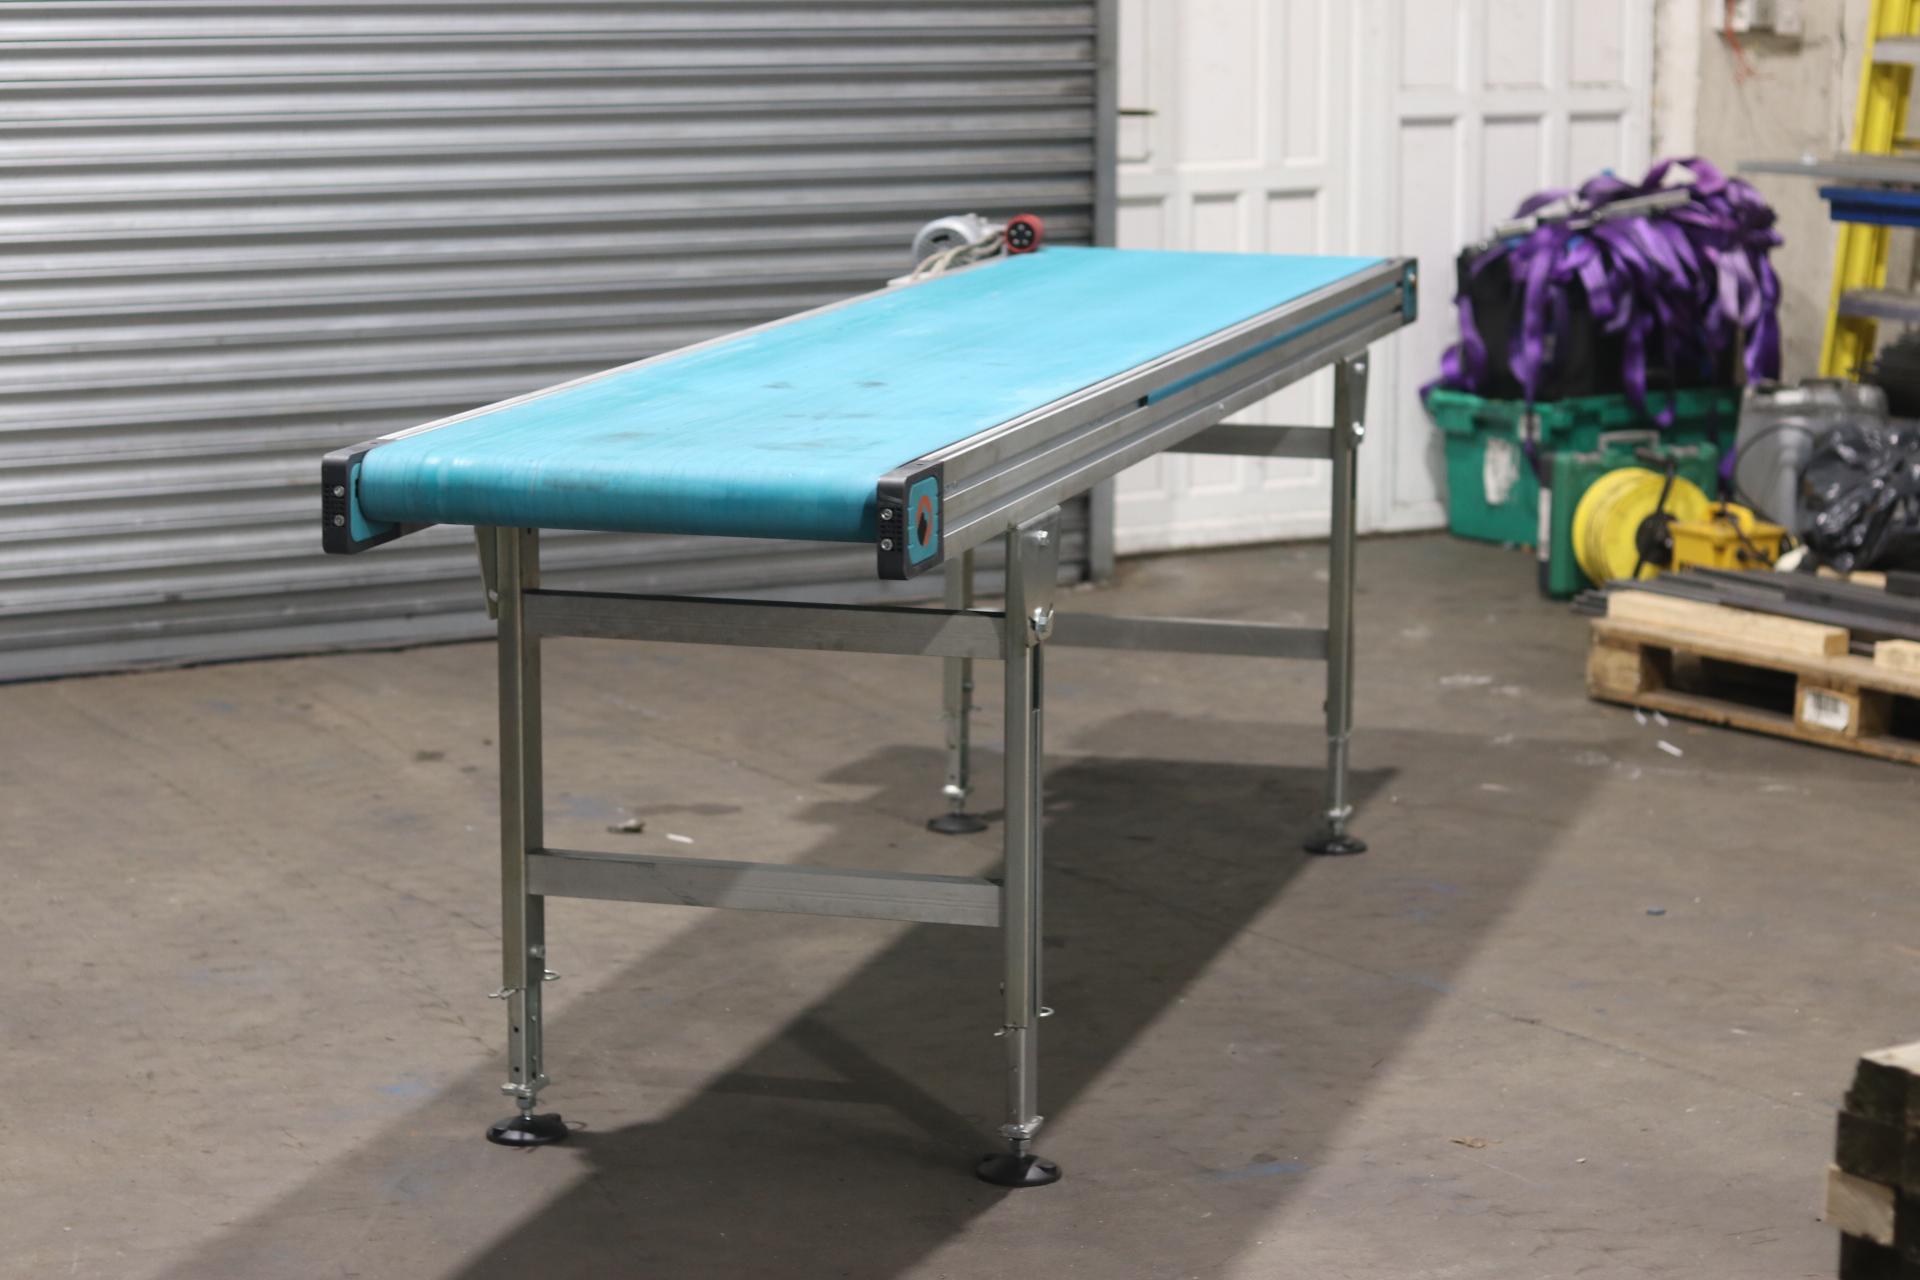 Used belt conveyor used belt conveyor suppliers second hand conveyor secondhand conveyor equipment